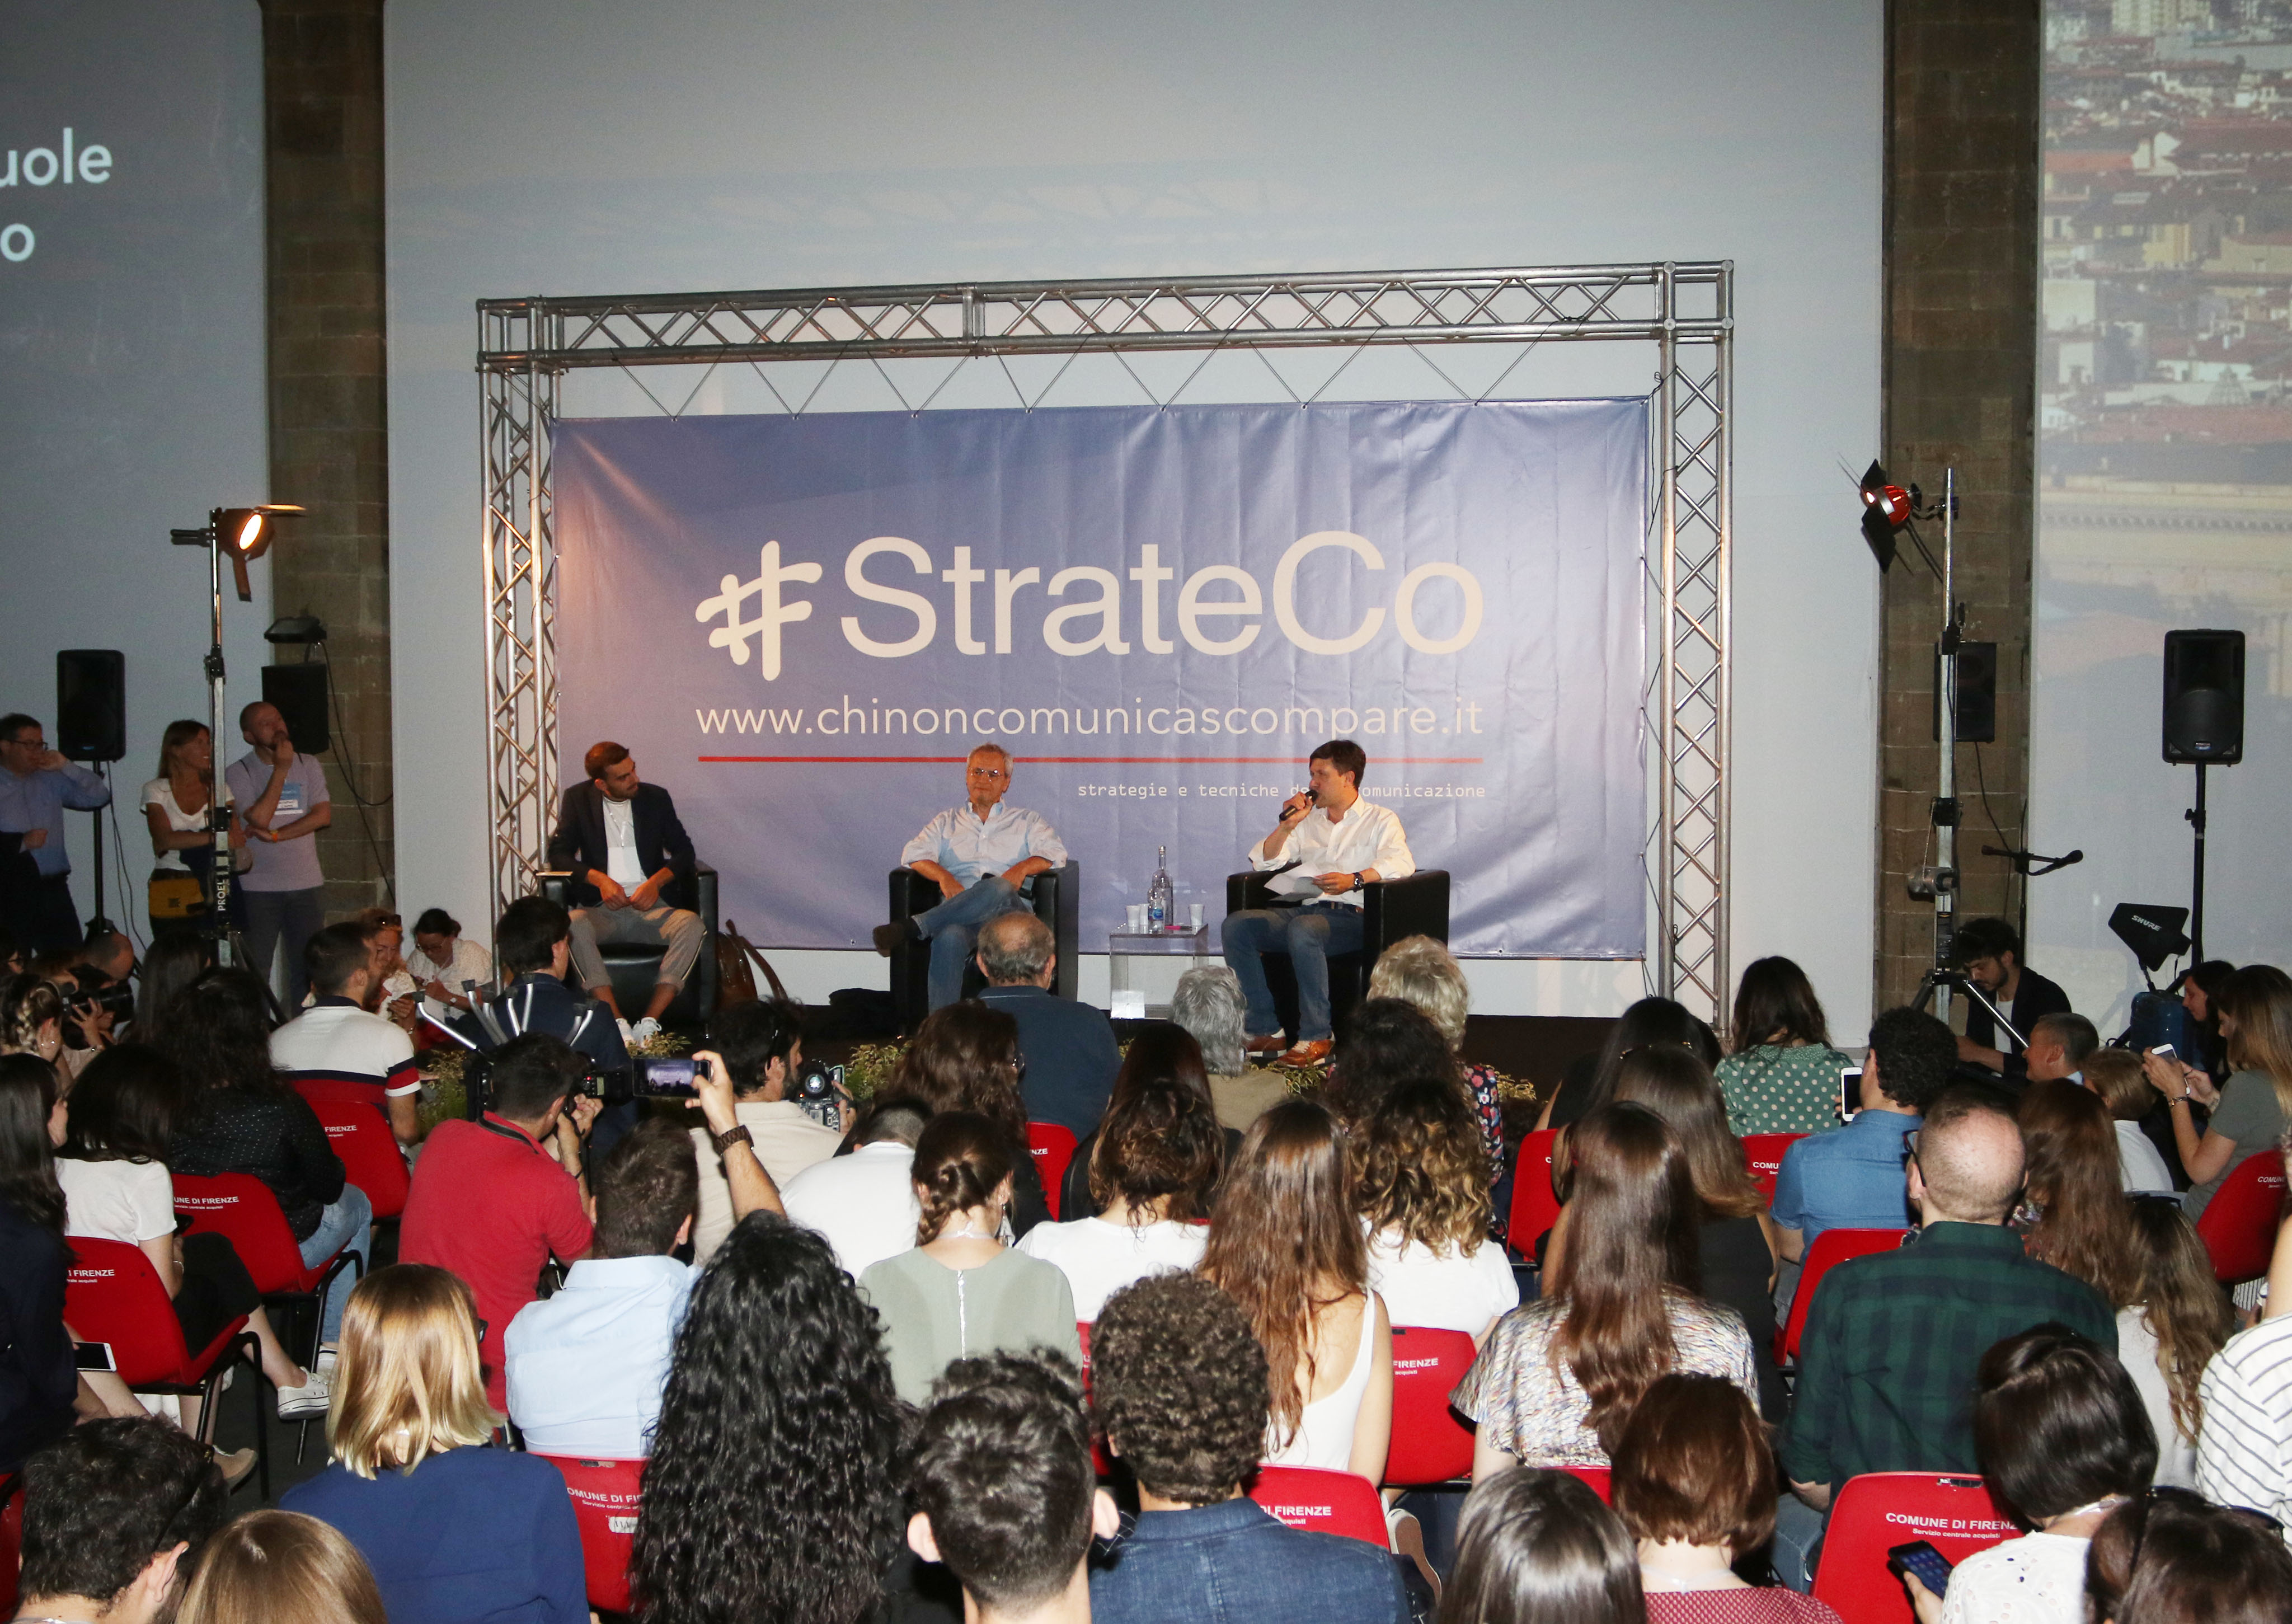 #StrateCo